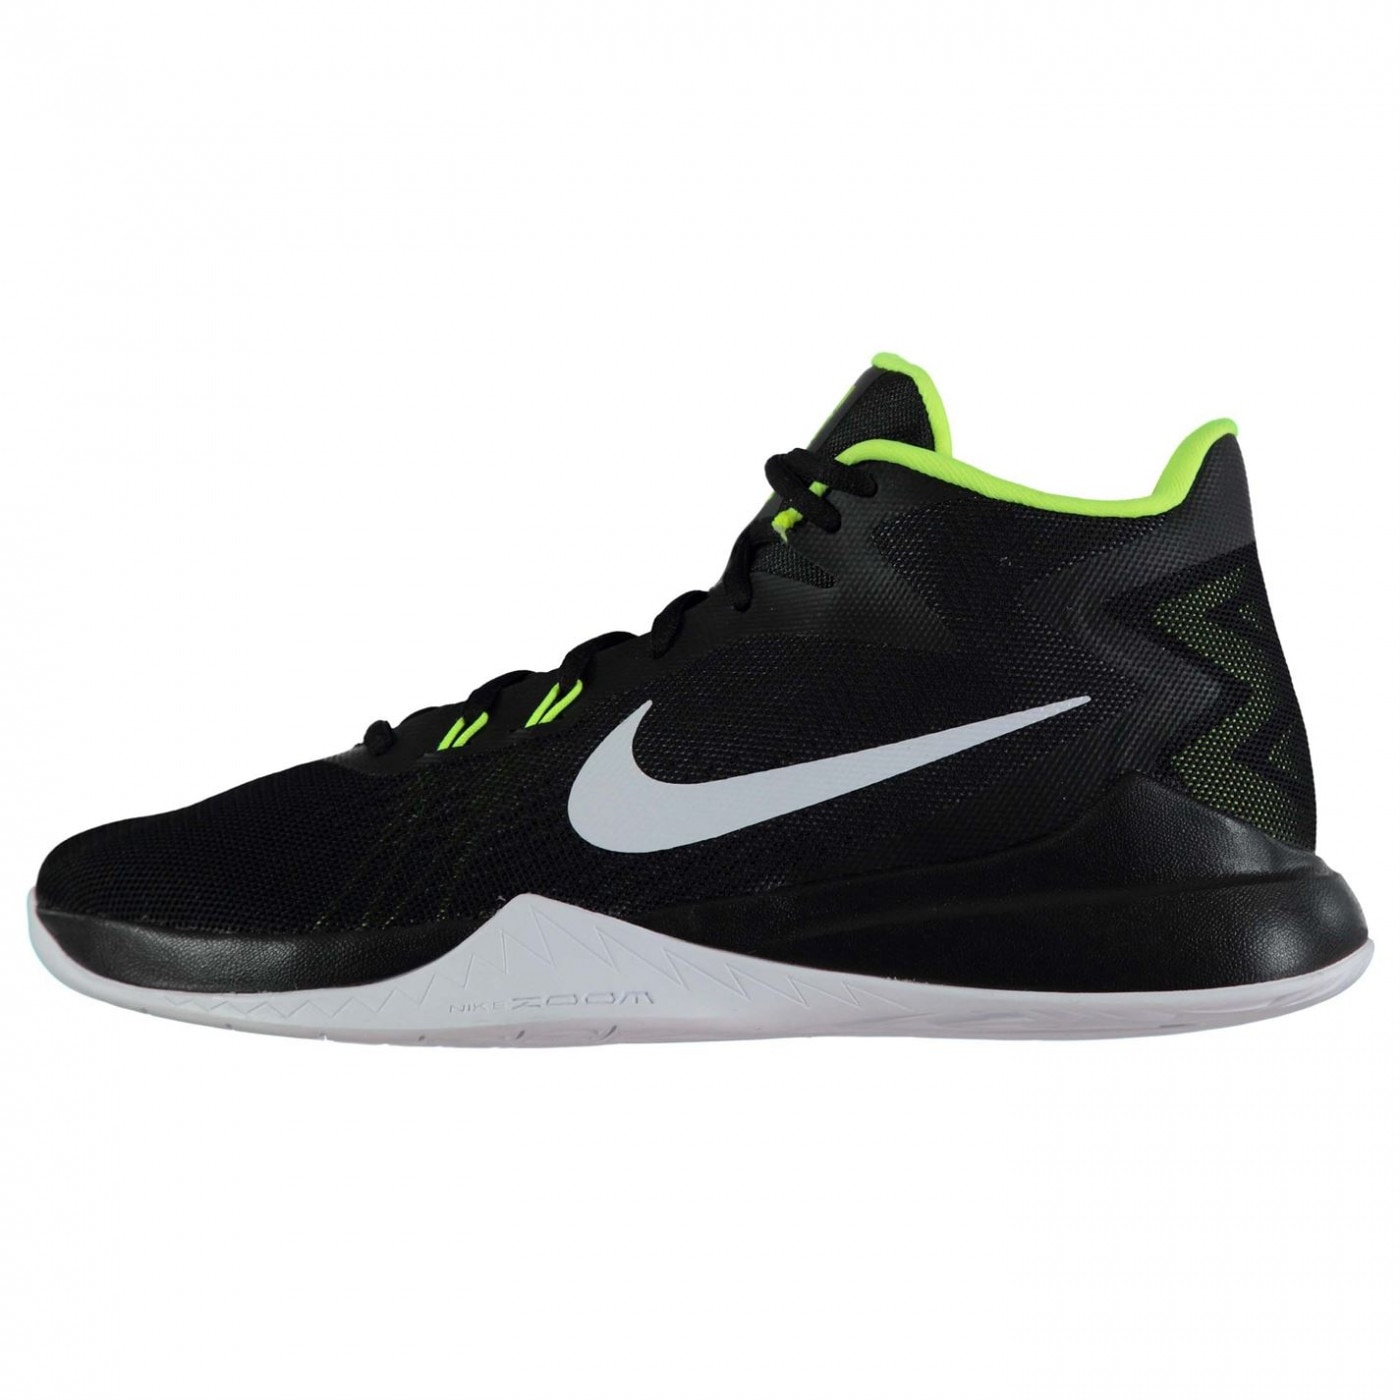 Nike Zoom Evidence Basketball Trainers Mens